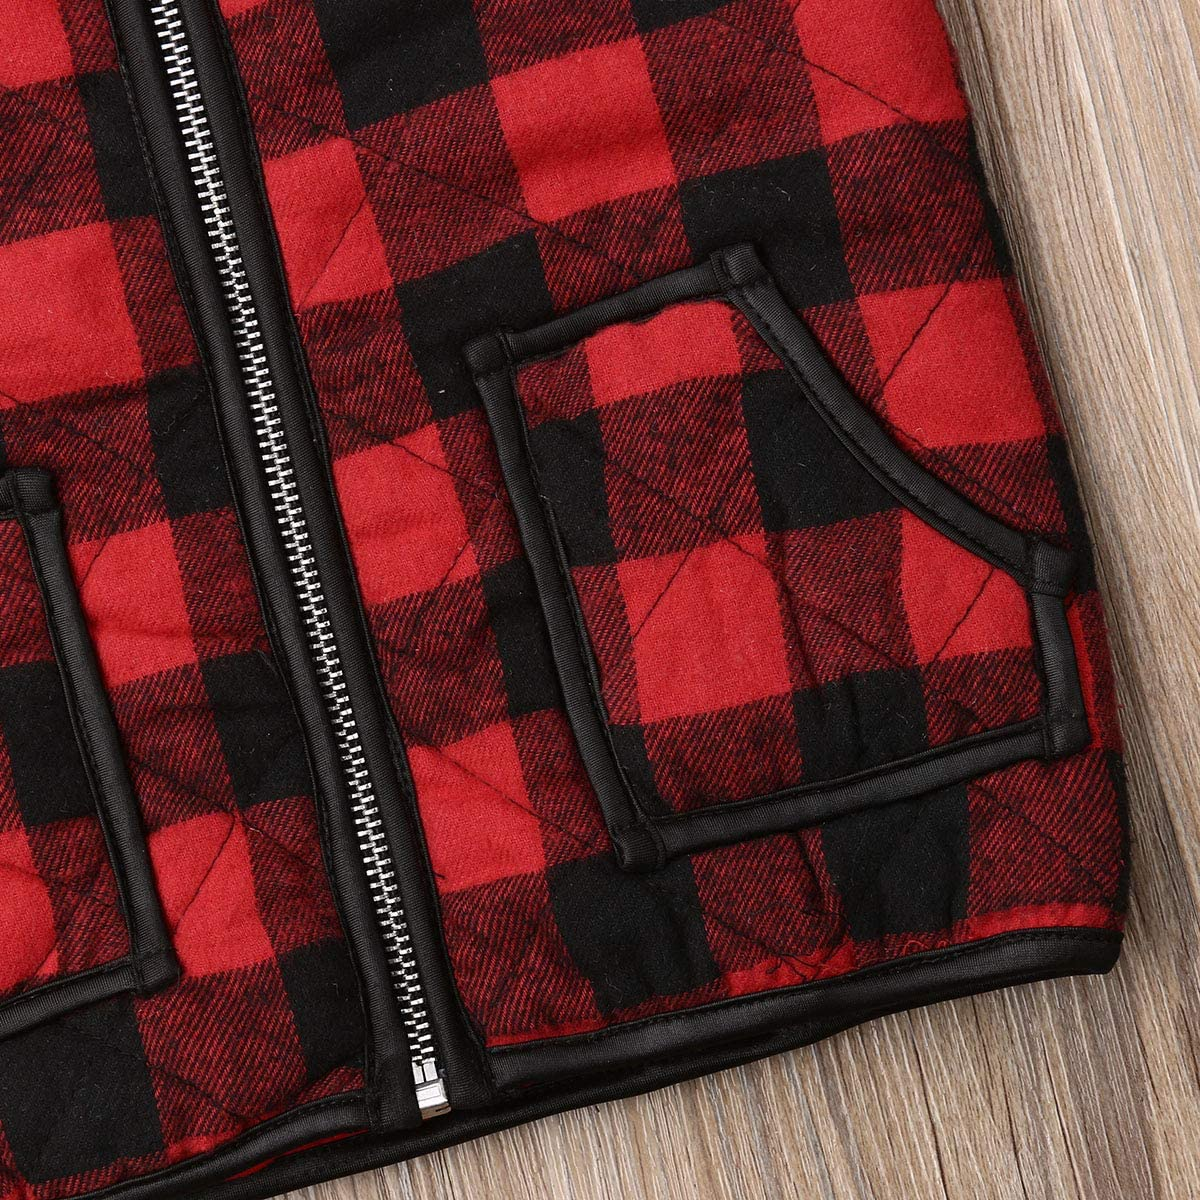 Toddler Unisex Baby Girl Boy Plaid Zipper Jacket Kids Sleeveless Winter Warm Waistcoat Vest Pocket Coat Chritmas Tops